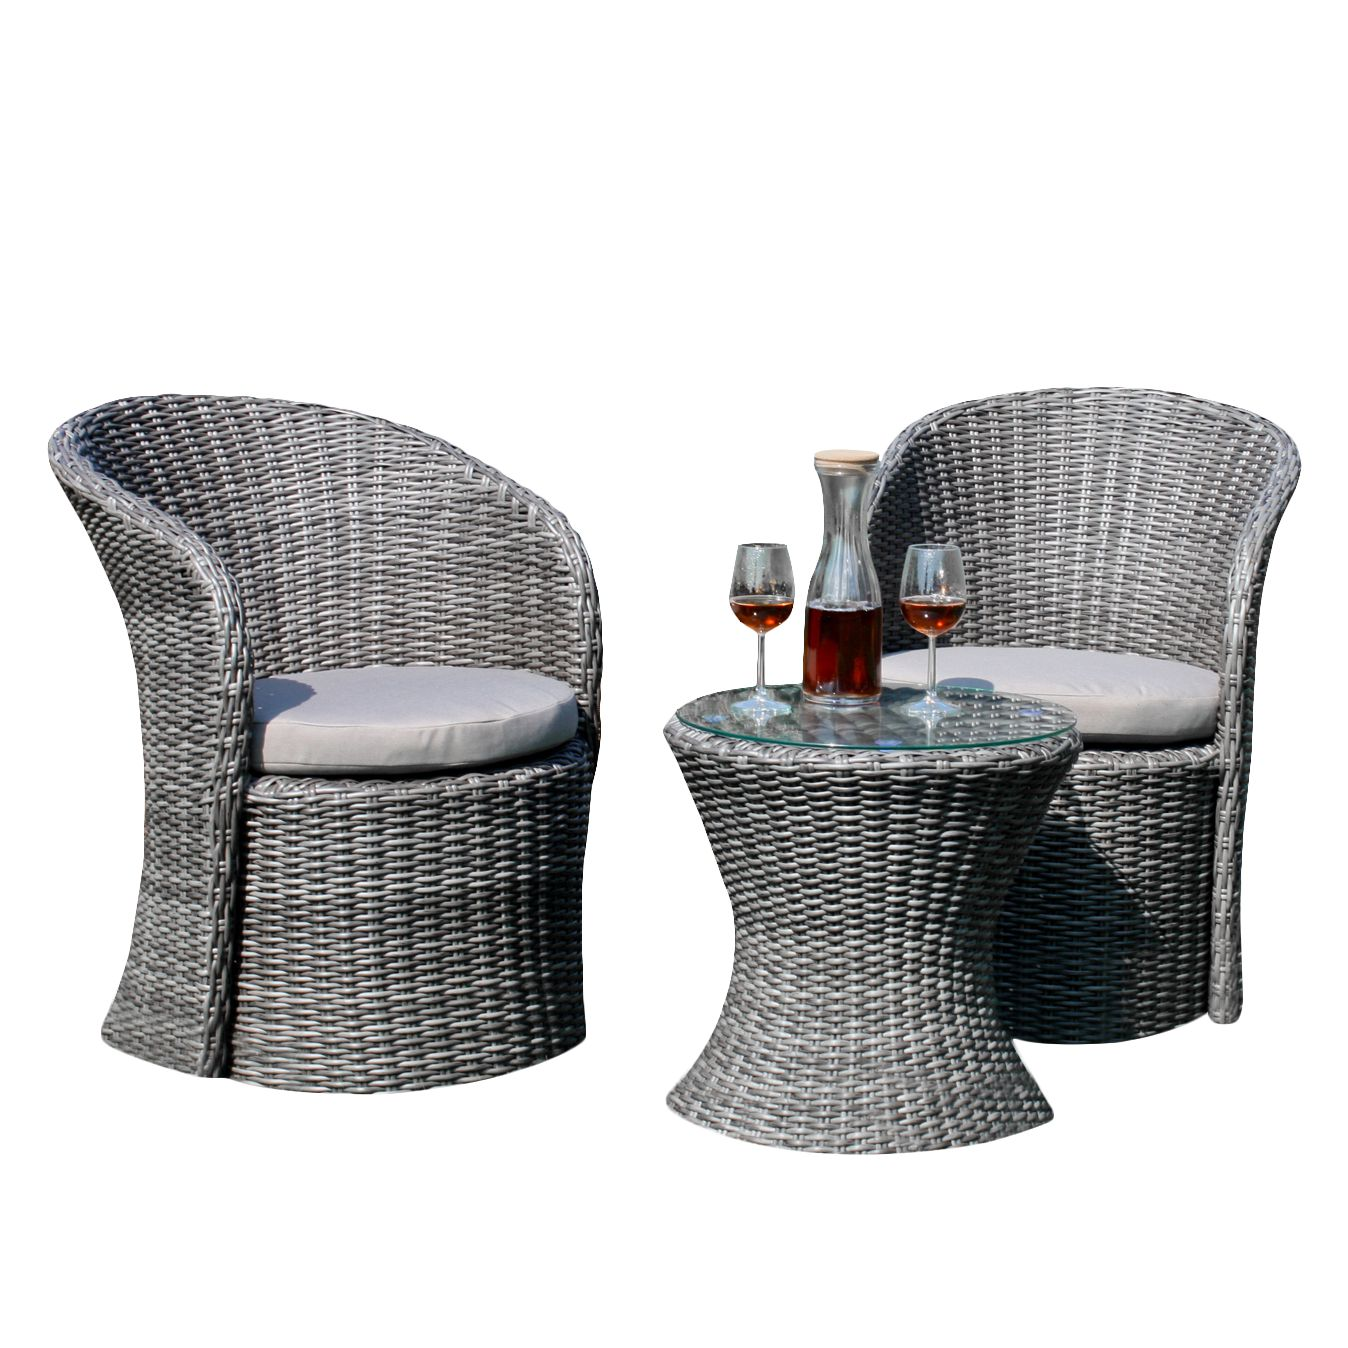 garden pleasure vagos preisvergleich. Black Bedroom Furniture Sets. Home Design Ideas